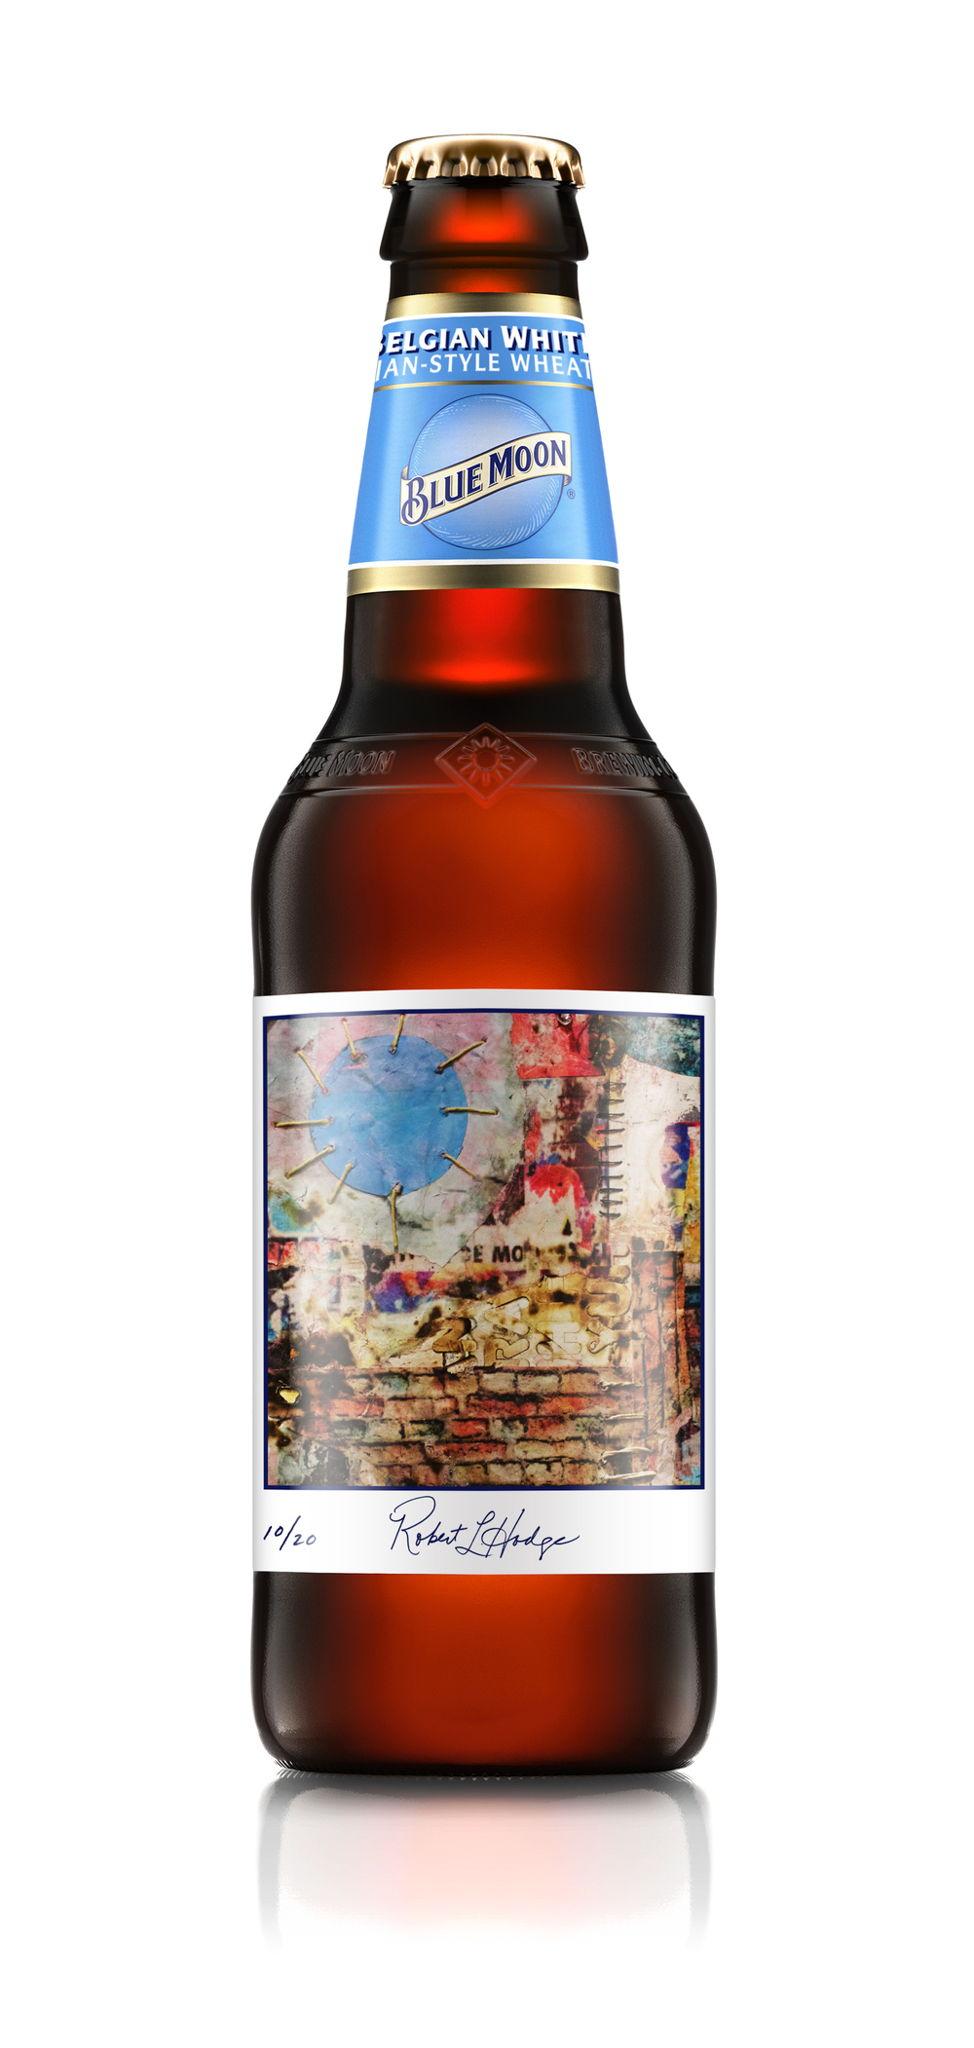 BMO-195A_Bottle_12z_Render_RobertHodge_150401_FJ.jpg